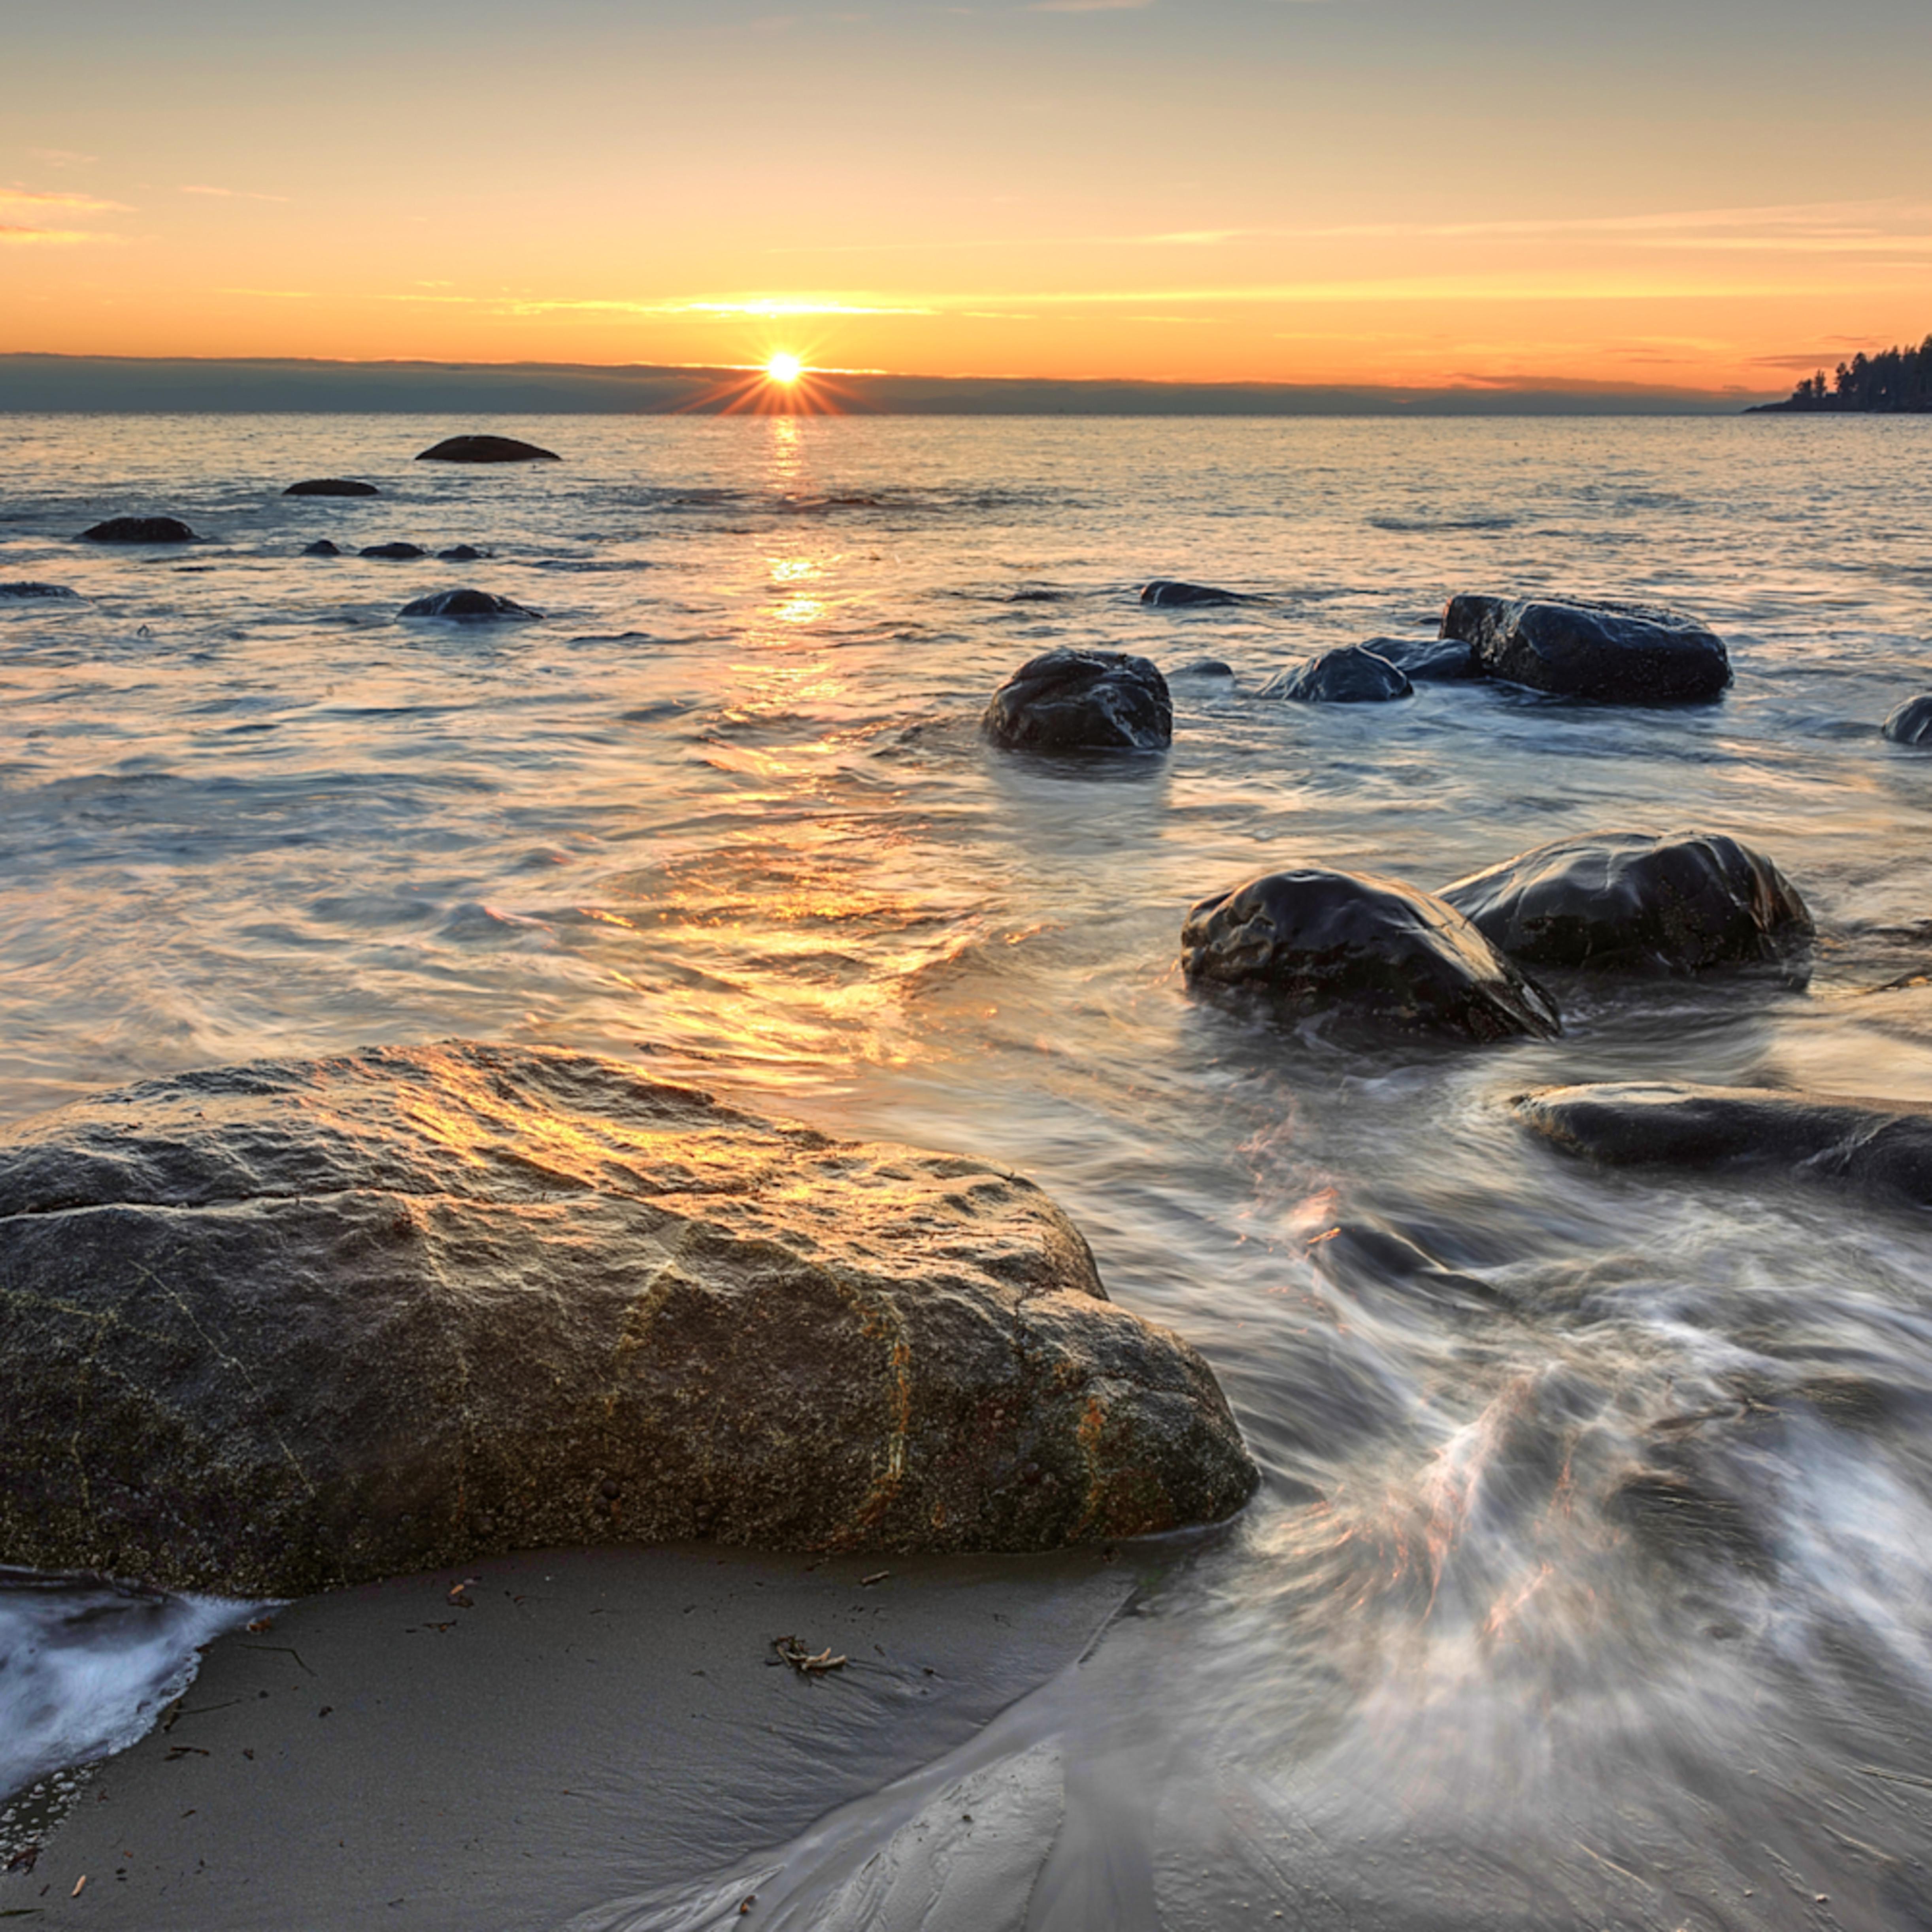 French beach vancouver island bc heather k jones jgx2xc